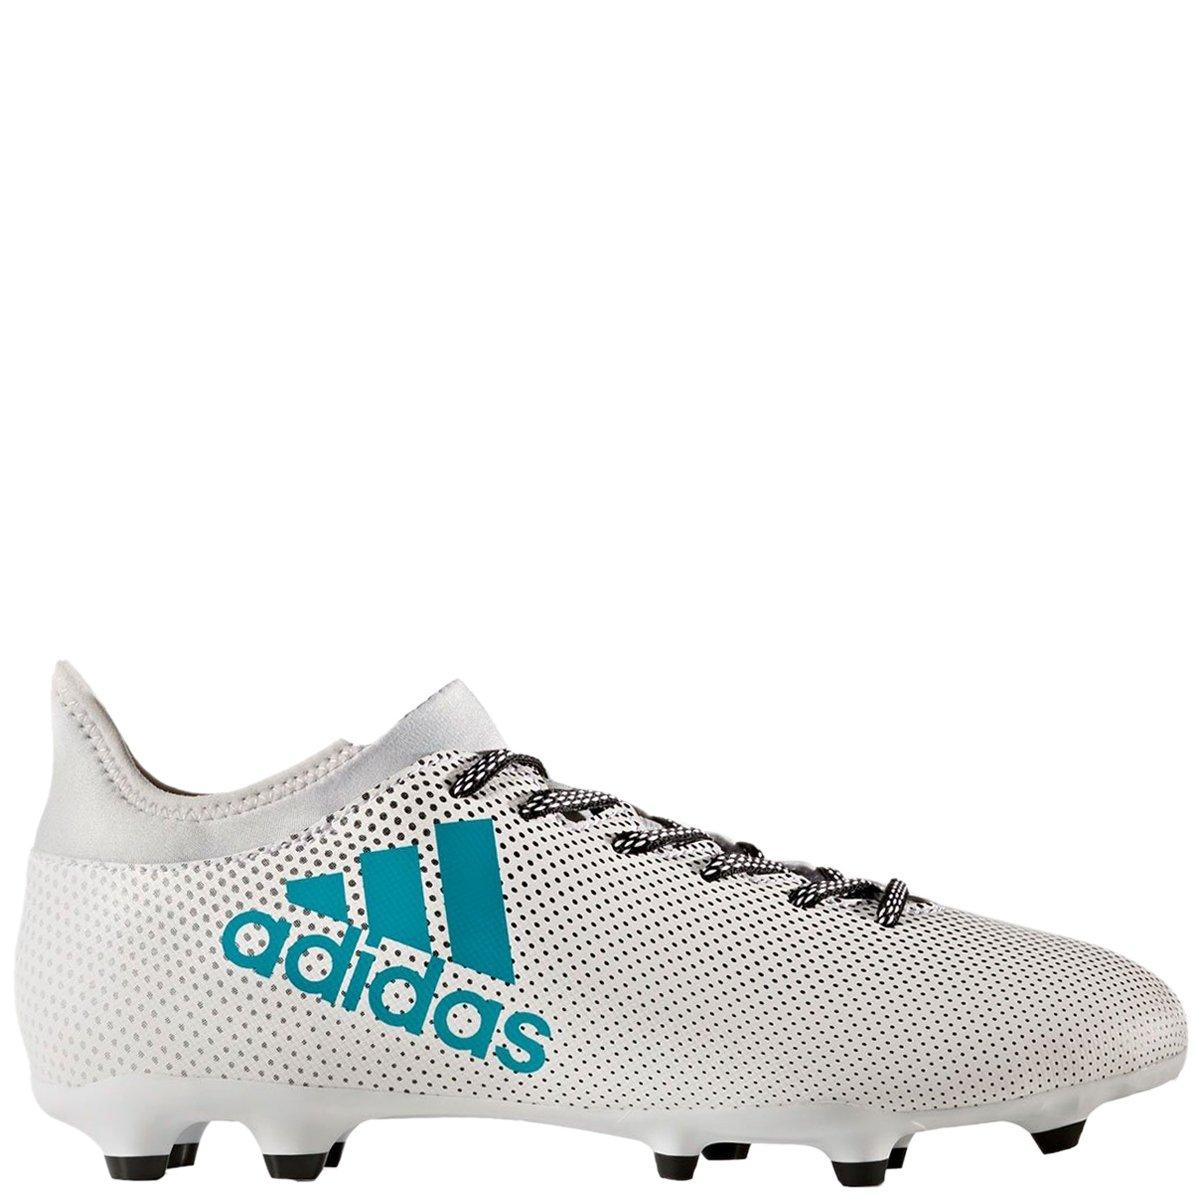 Bizz Store - Chuteira Futebol De Campo Masculina Adidas X 17.3 FG 569301c7ba19e